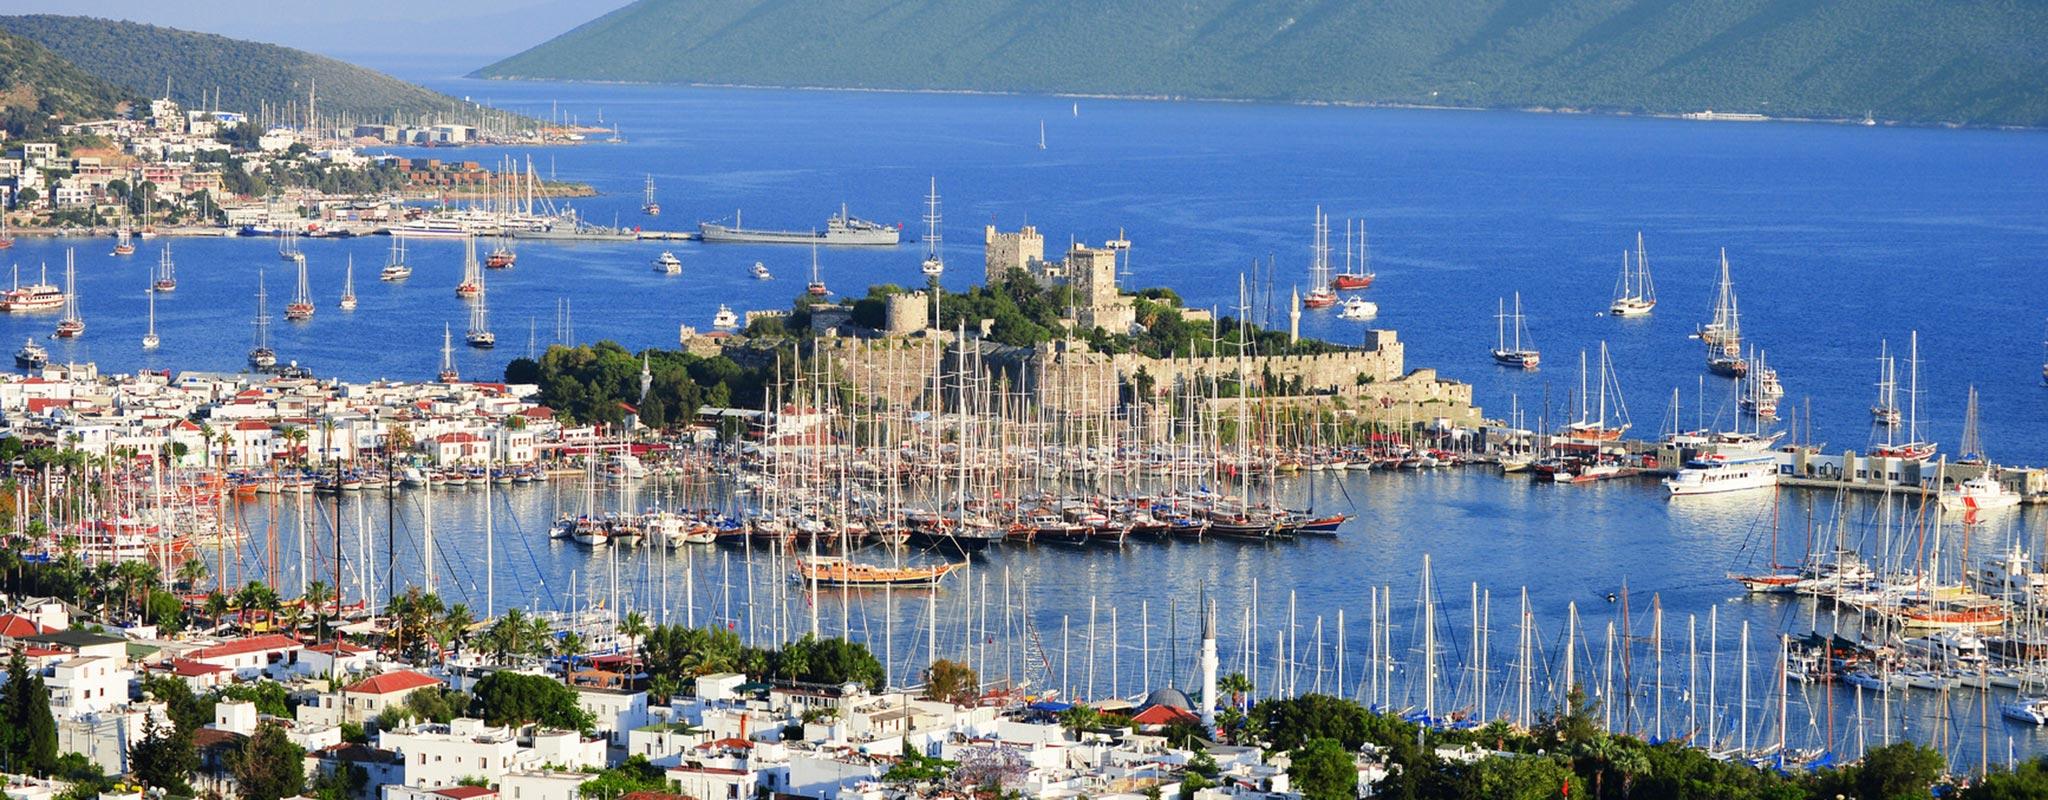 View of Bodrum harbor